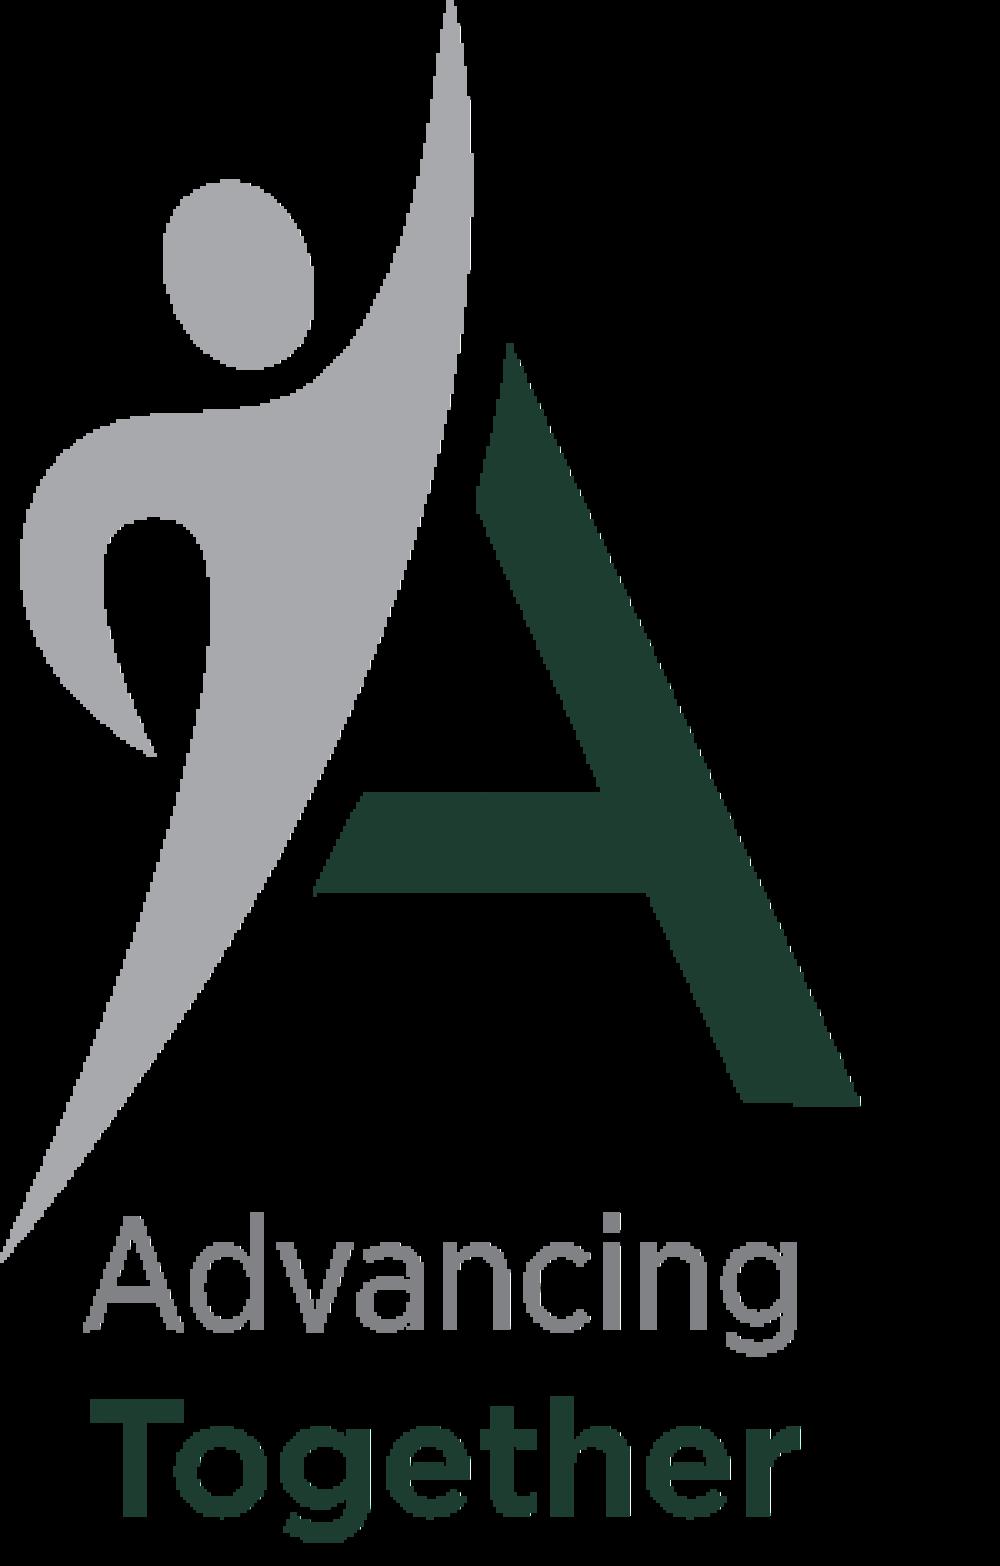 advancing-together-logo